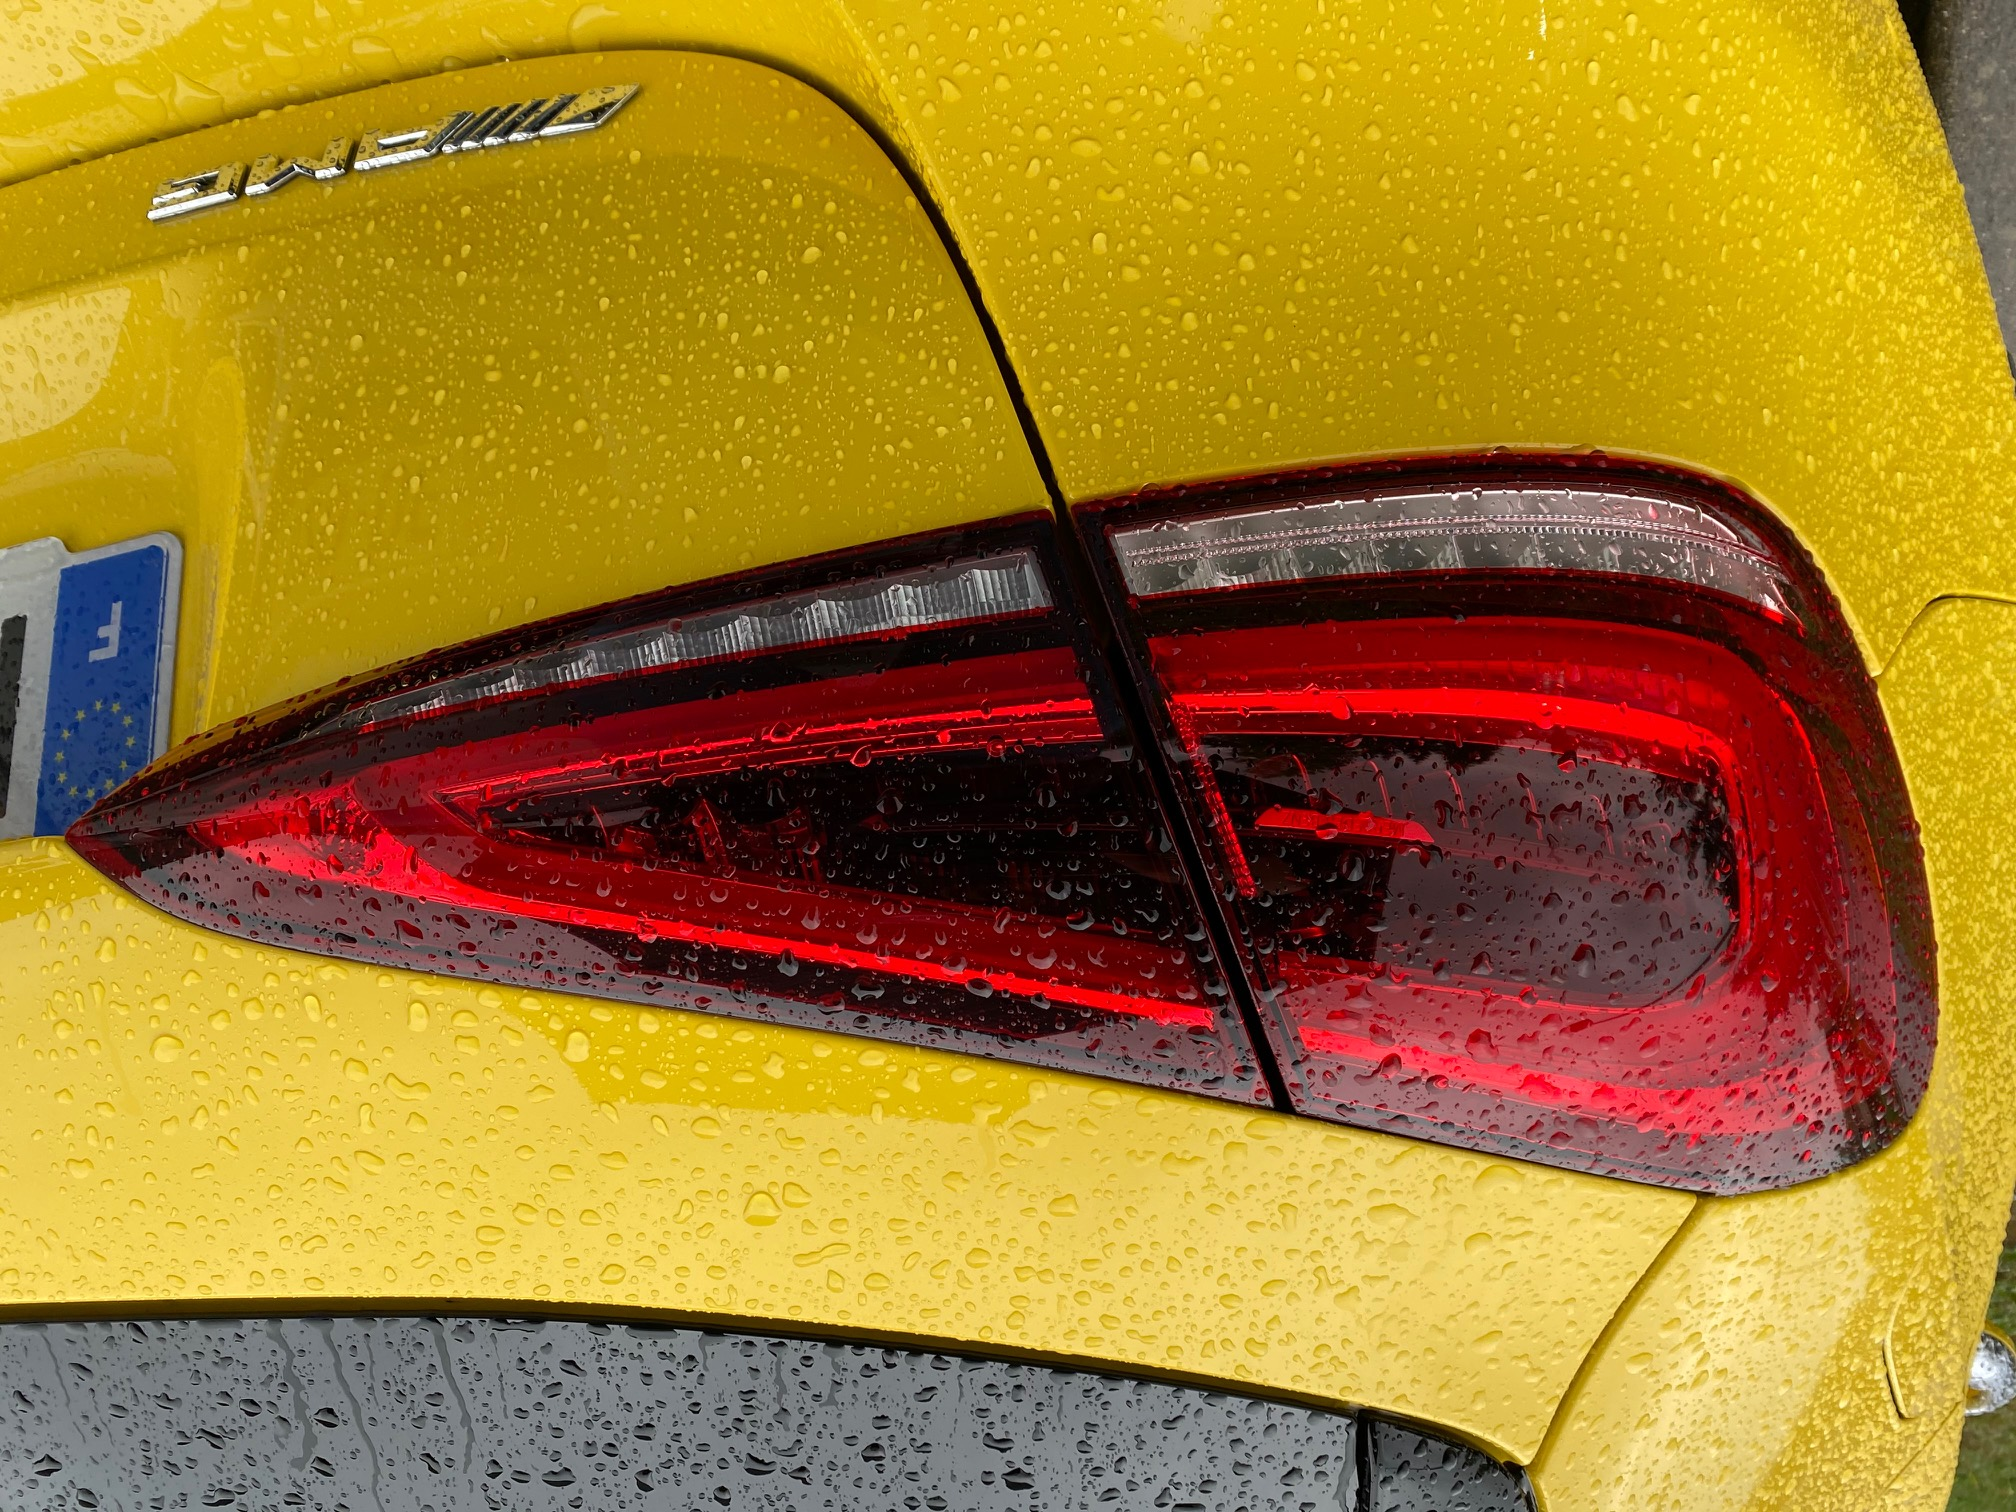 Mercedes, mercedes AMG, compacten compacte sportive, voiture sportive, classe a